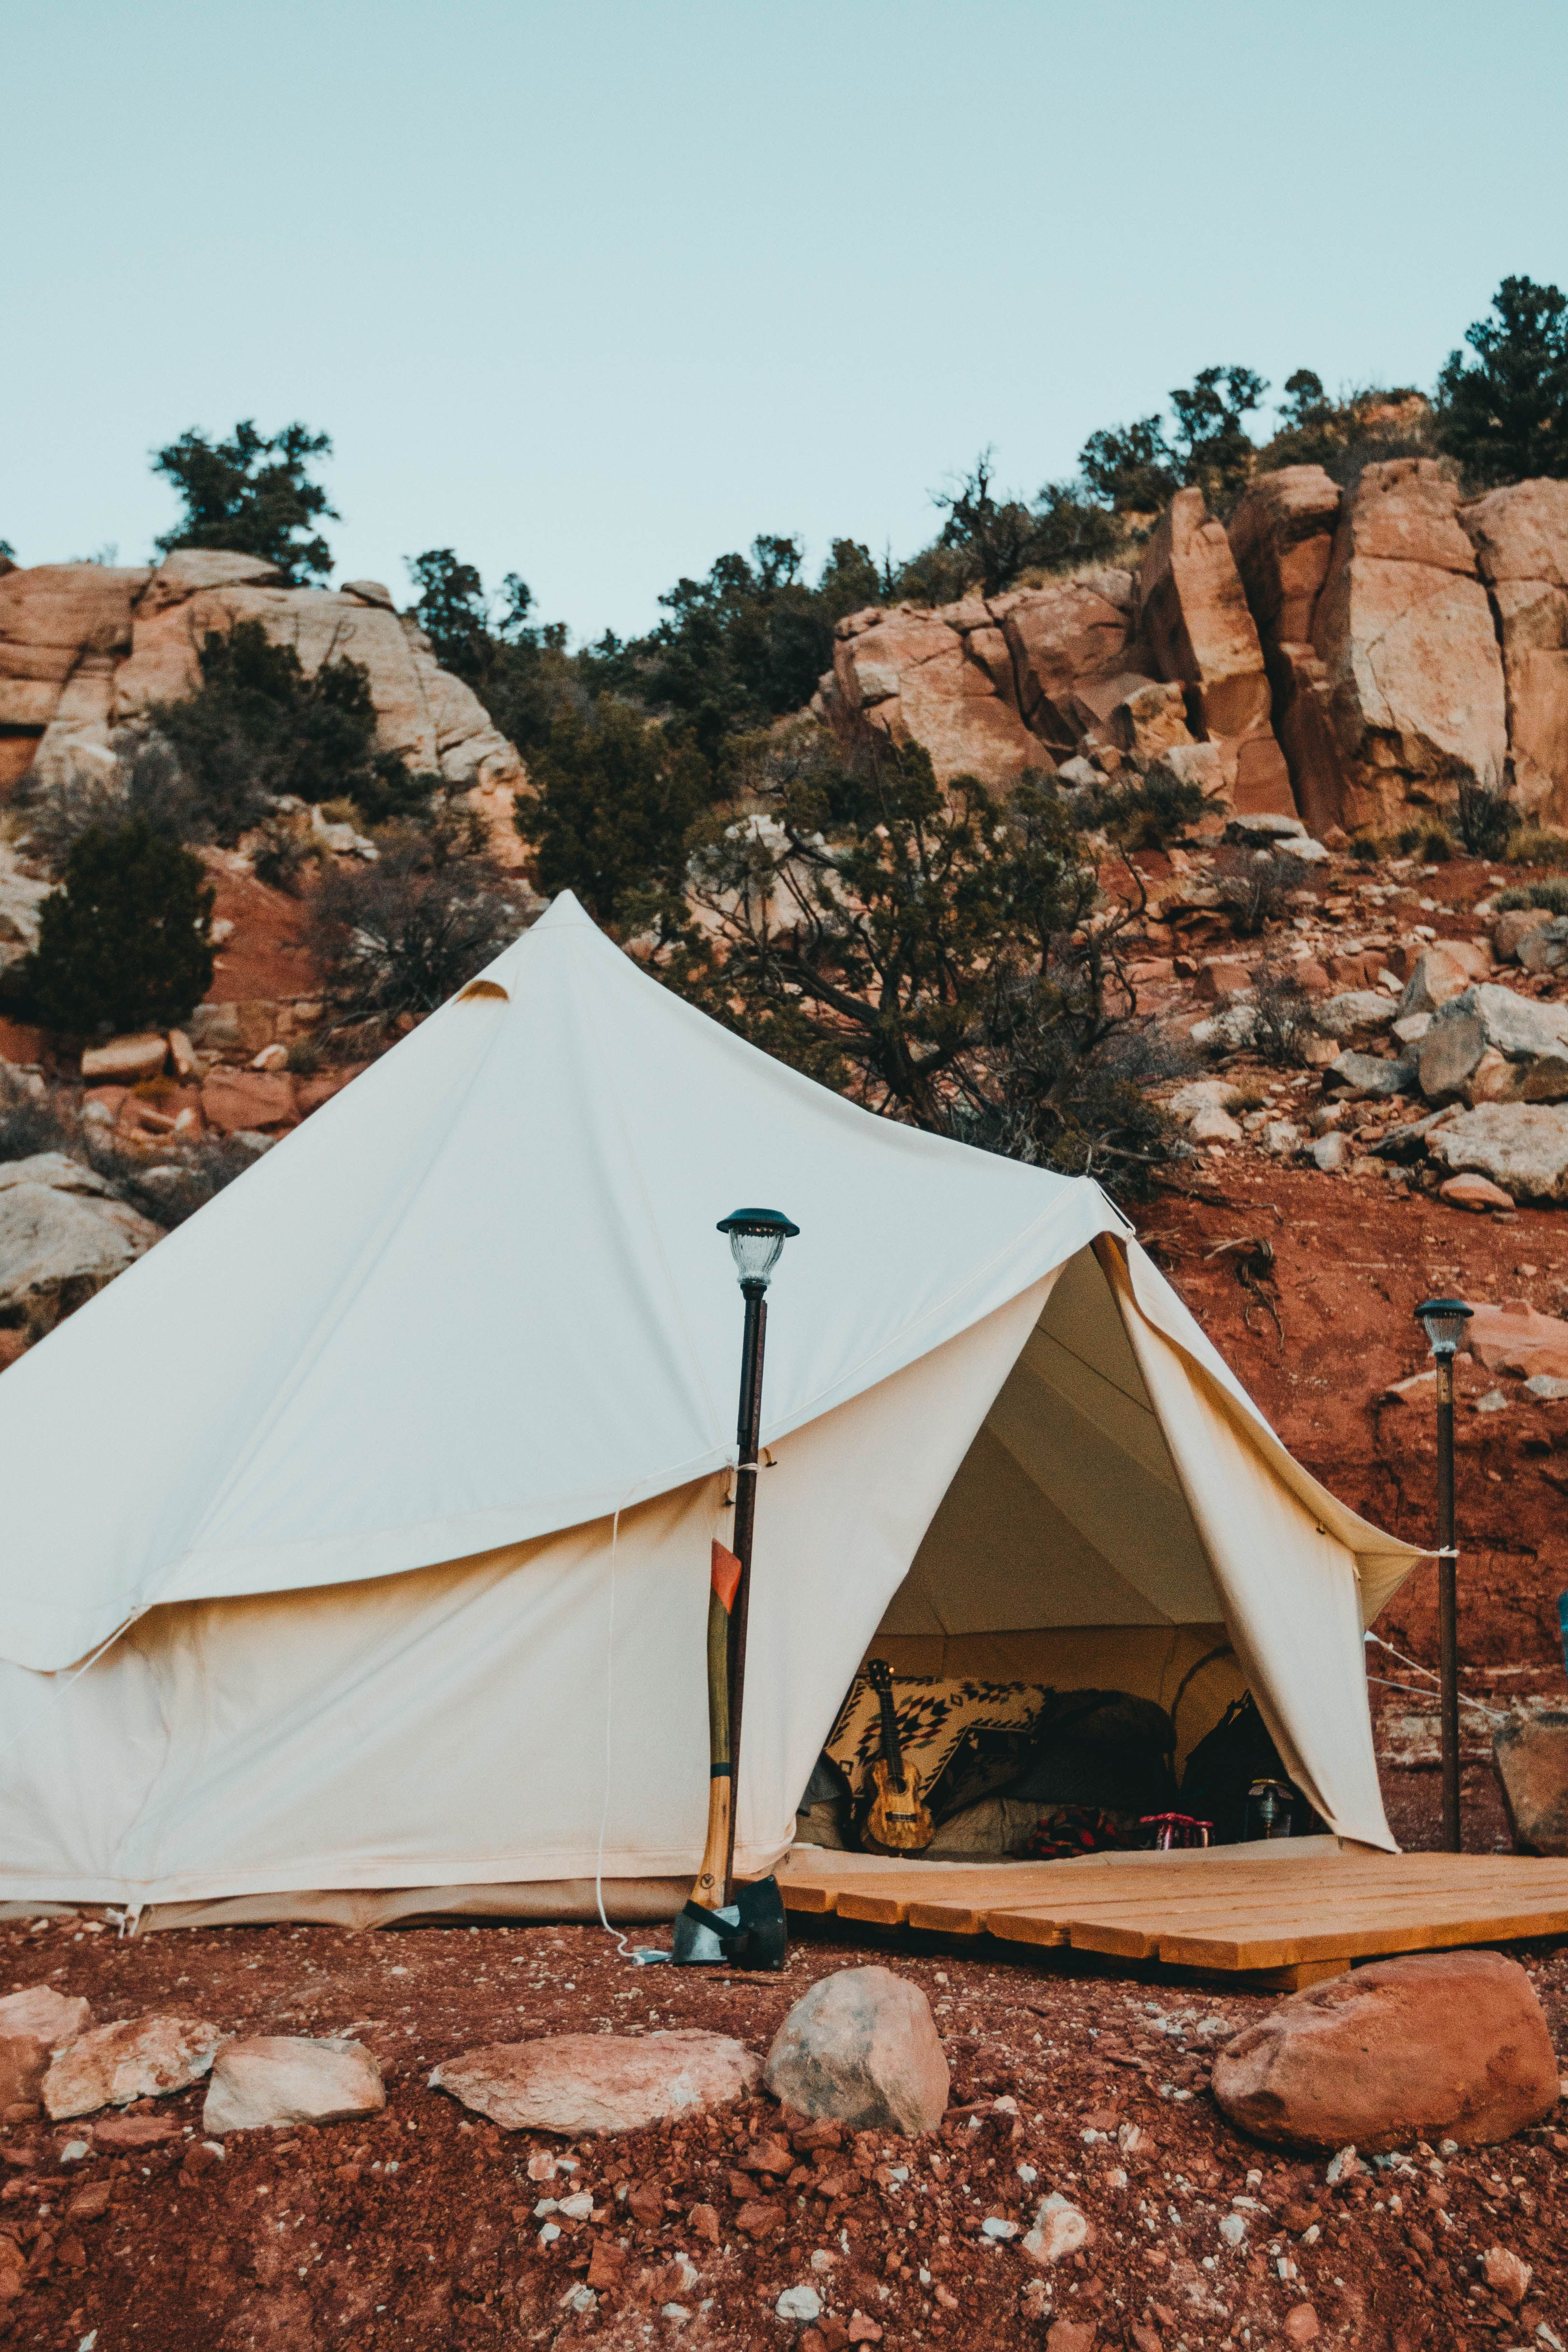 park cabins national facilities camping near resort rv zion